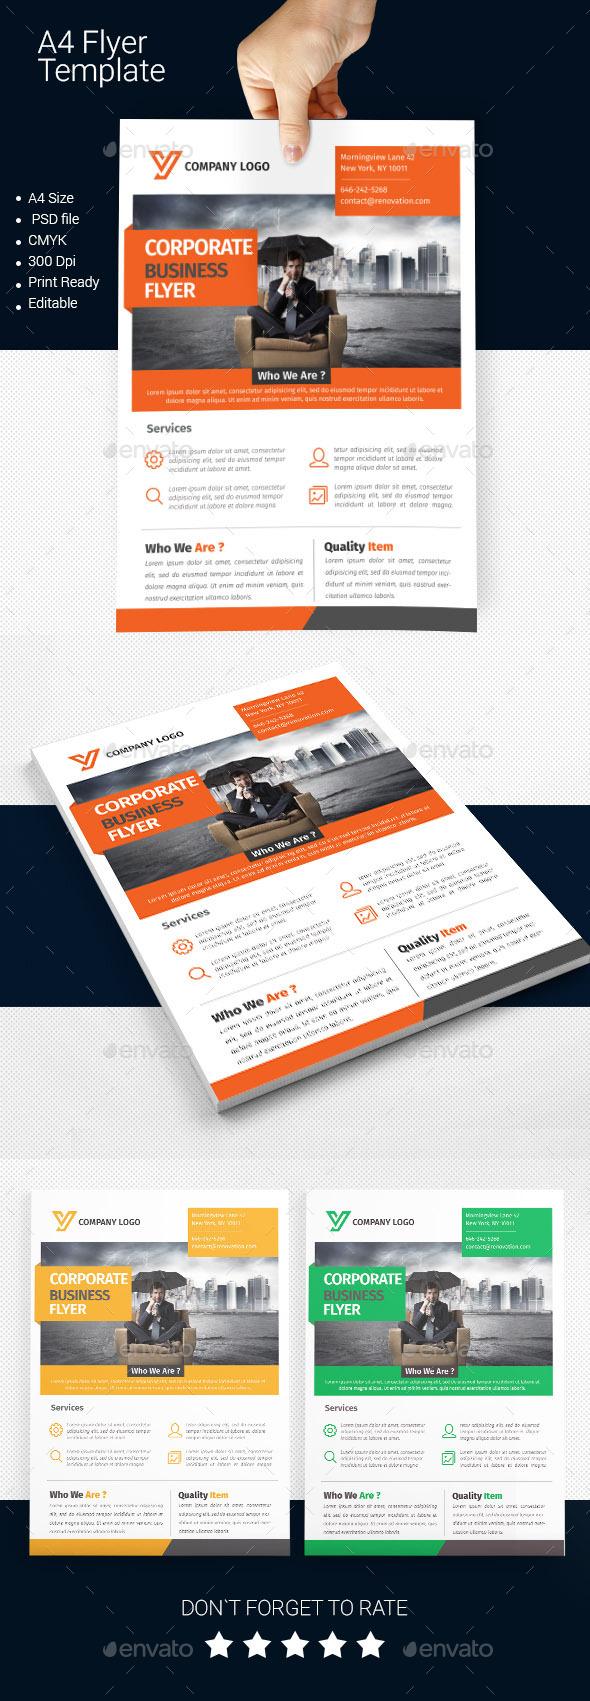 Company Flyer By Creativity Design Graphicriver